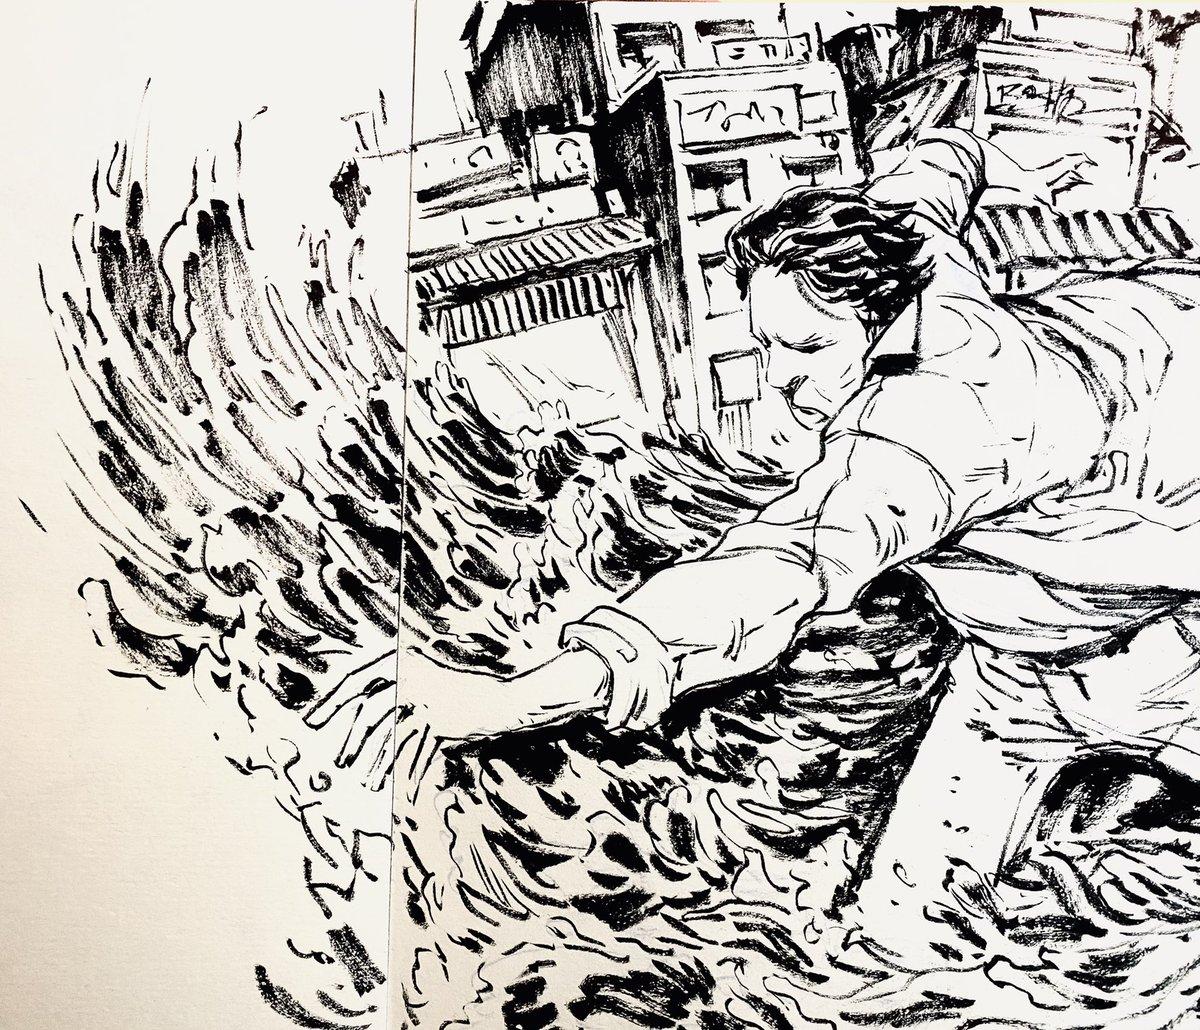 Don't ask me what is this ?! Just Daily sketch 😅#dailysketch #art #dailyinking #quickink #clowns #crosehatching #basharart #zurich #olten #head #ink #inkbrush  #anime #manga #comic #wiseman #visual #art #kunst #komic #traditionalart #budo #japan #monk #artwork #dailyart